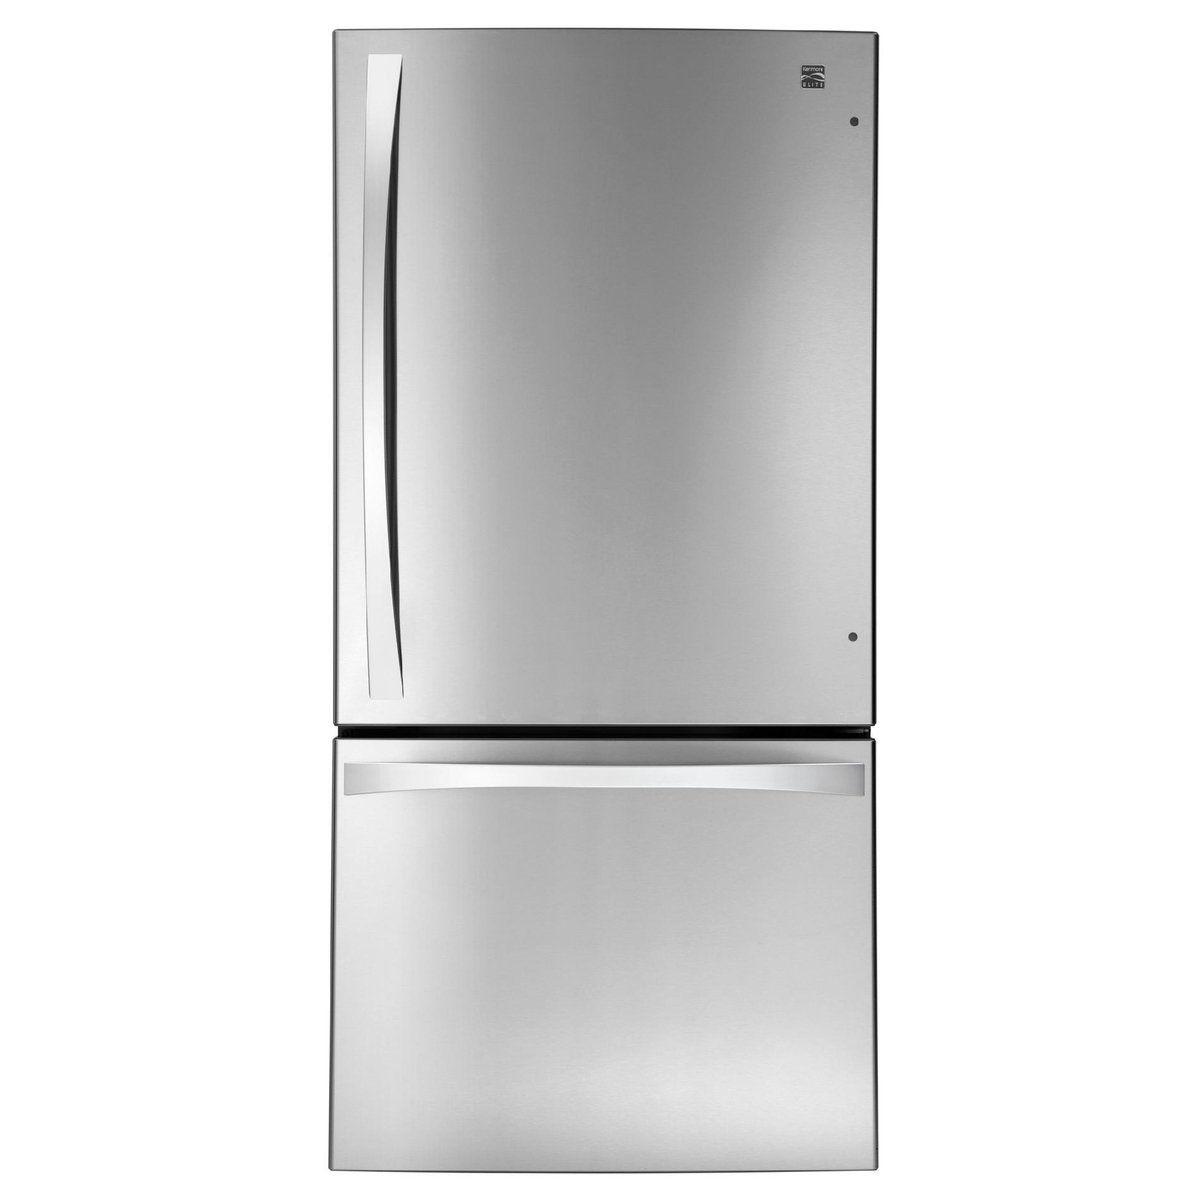 Best Overall Kenmore Elite 79043 Bottom Freezer Refrigerator